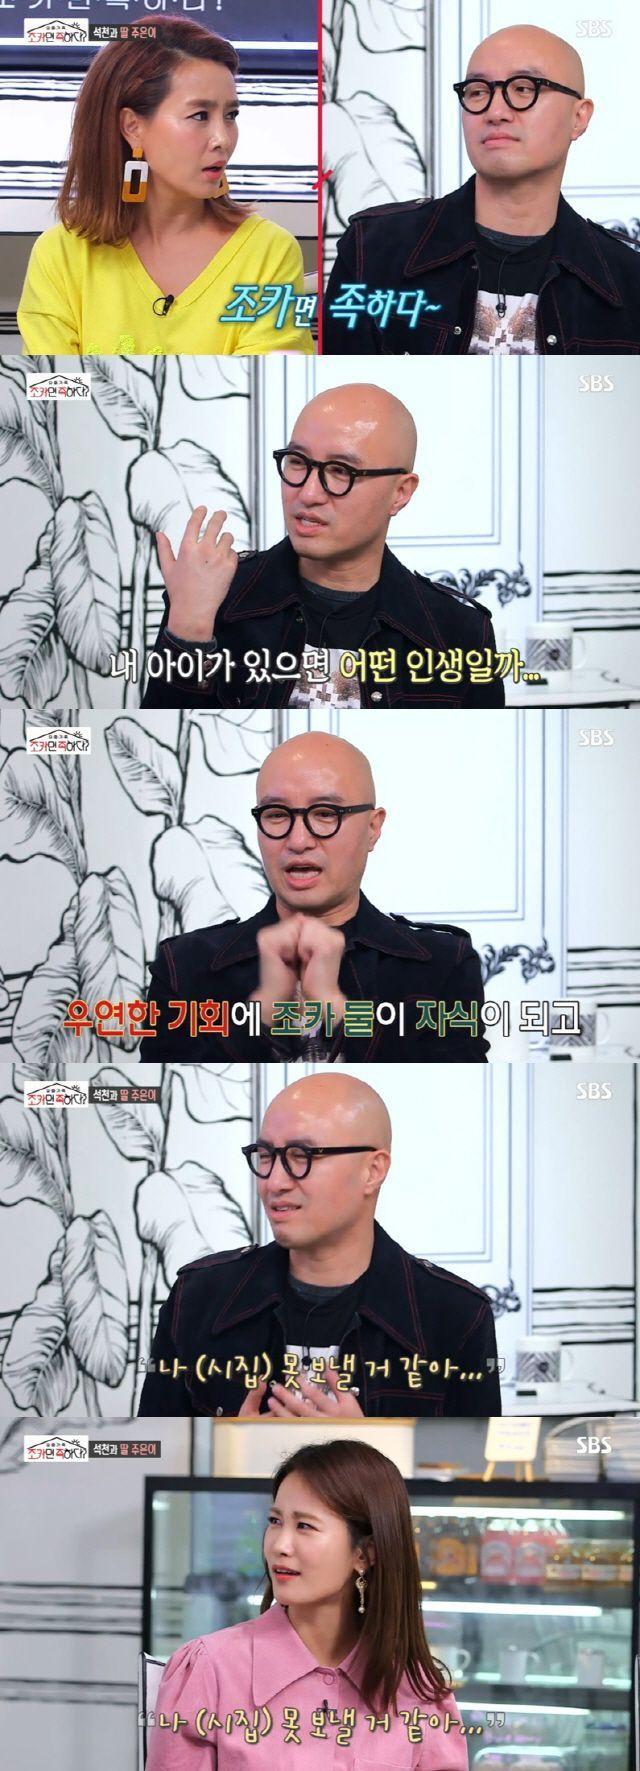 SBS '조카면 족하다' 방송인 홍석천 / 사진=SBS 방송 캡처